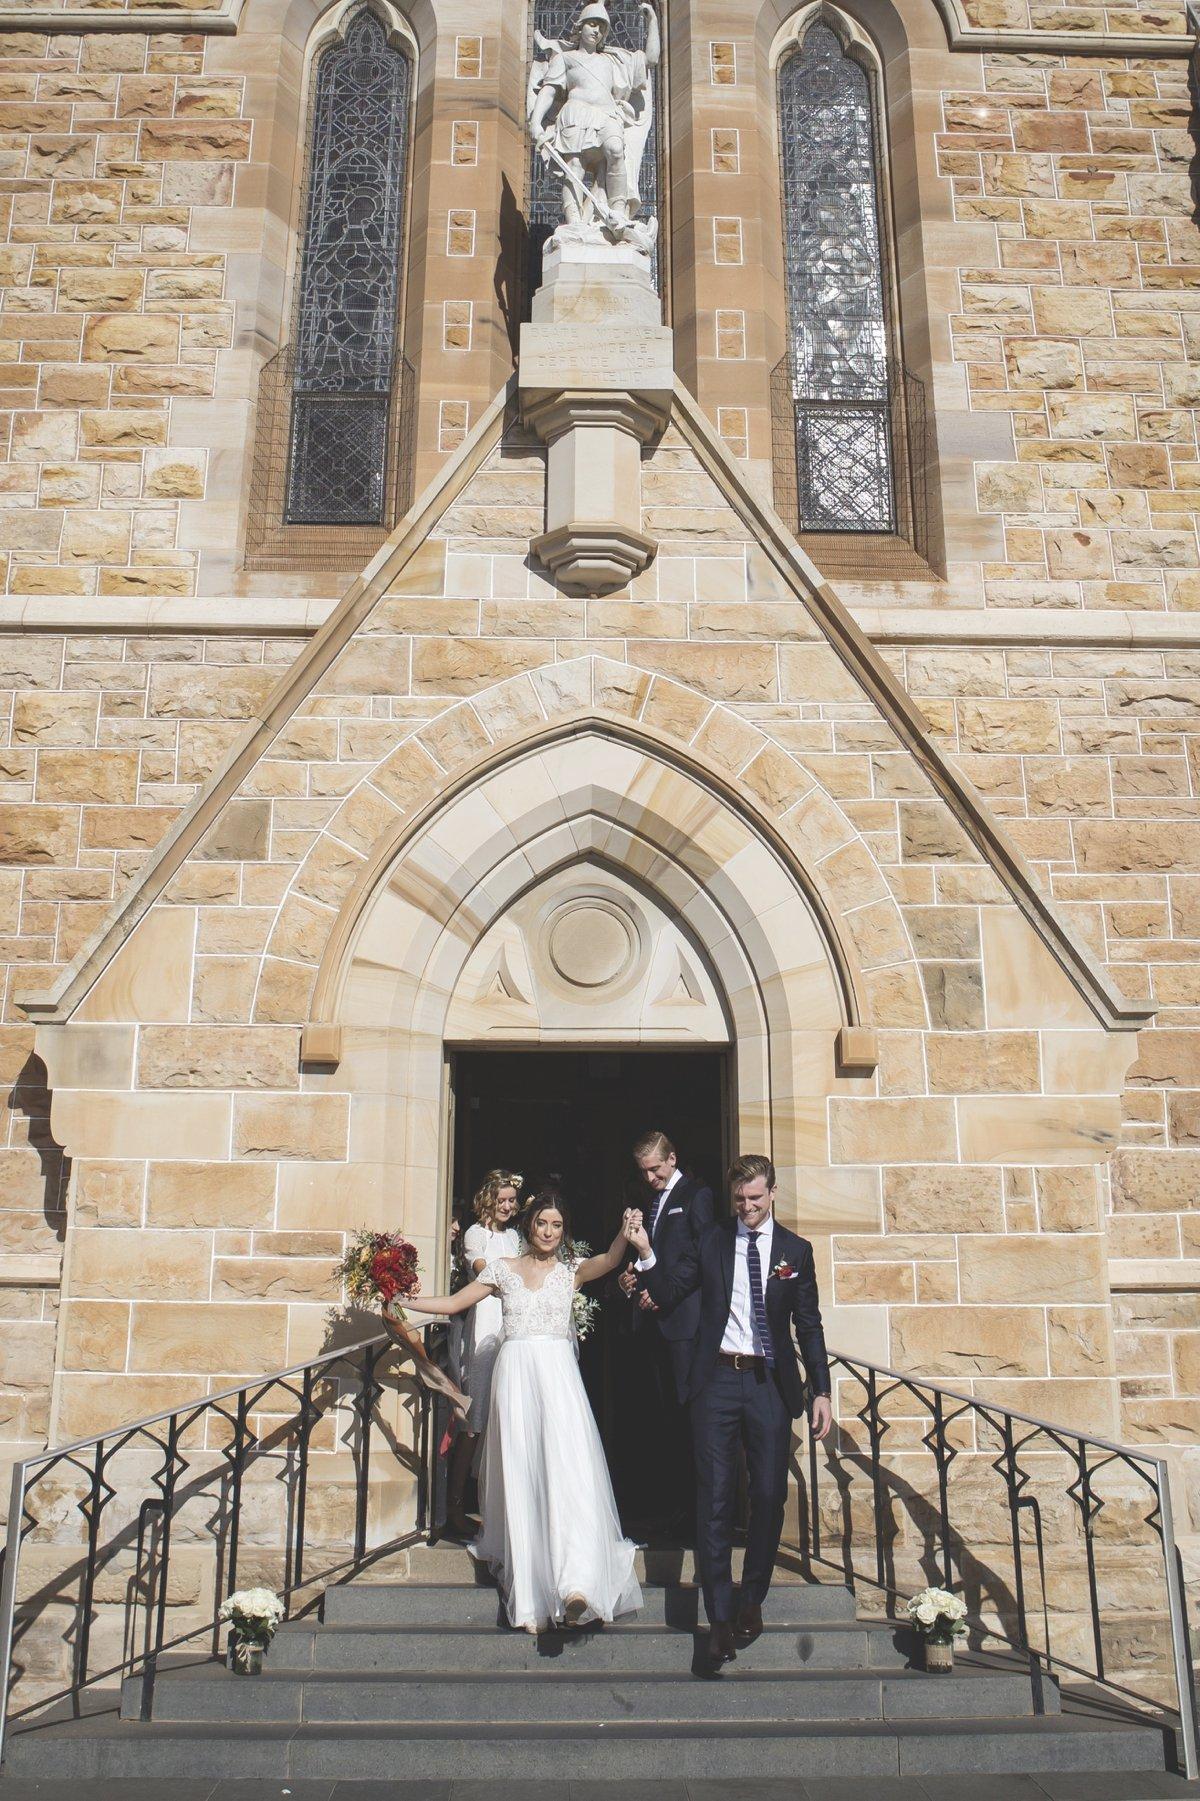 Wagga Wagga Wedding Photographer at Borambola Winery Wagga Wagga Albury wedding photographer Culcairn wedding venue_1181